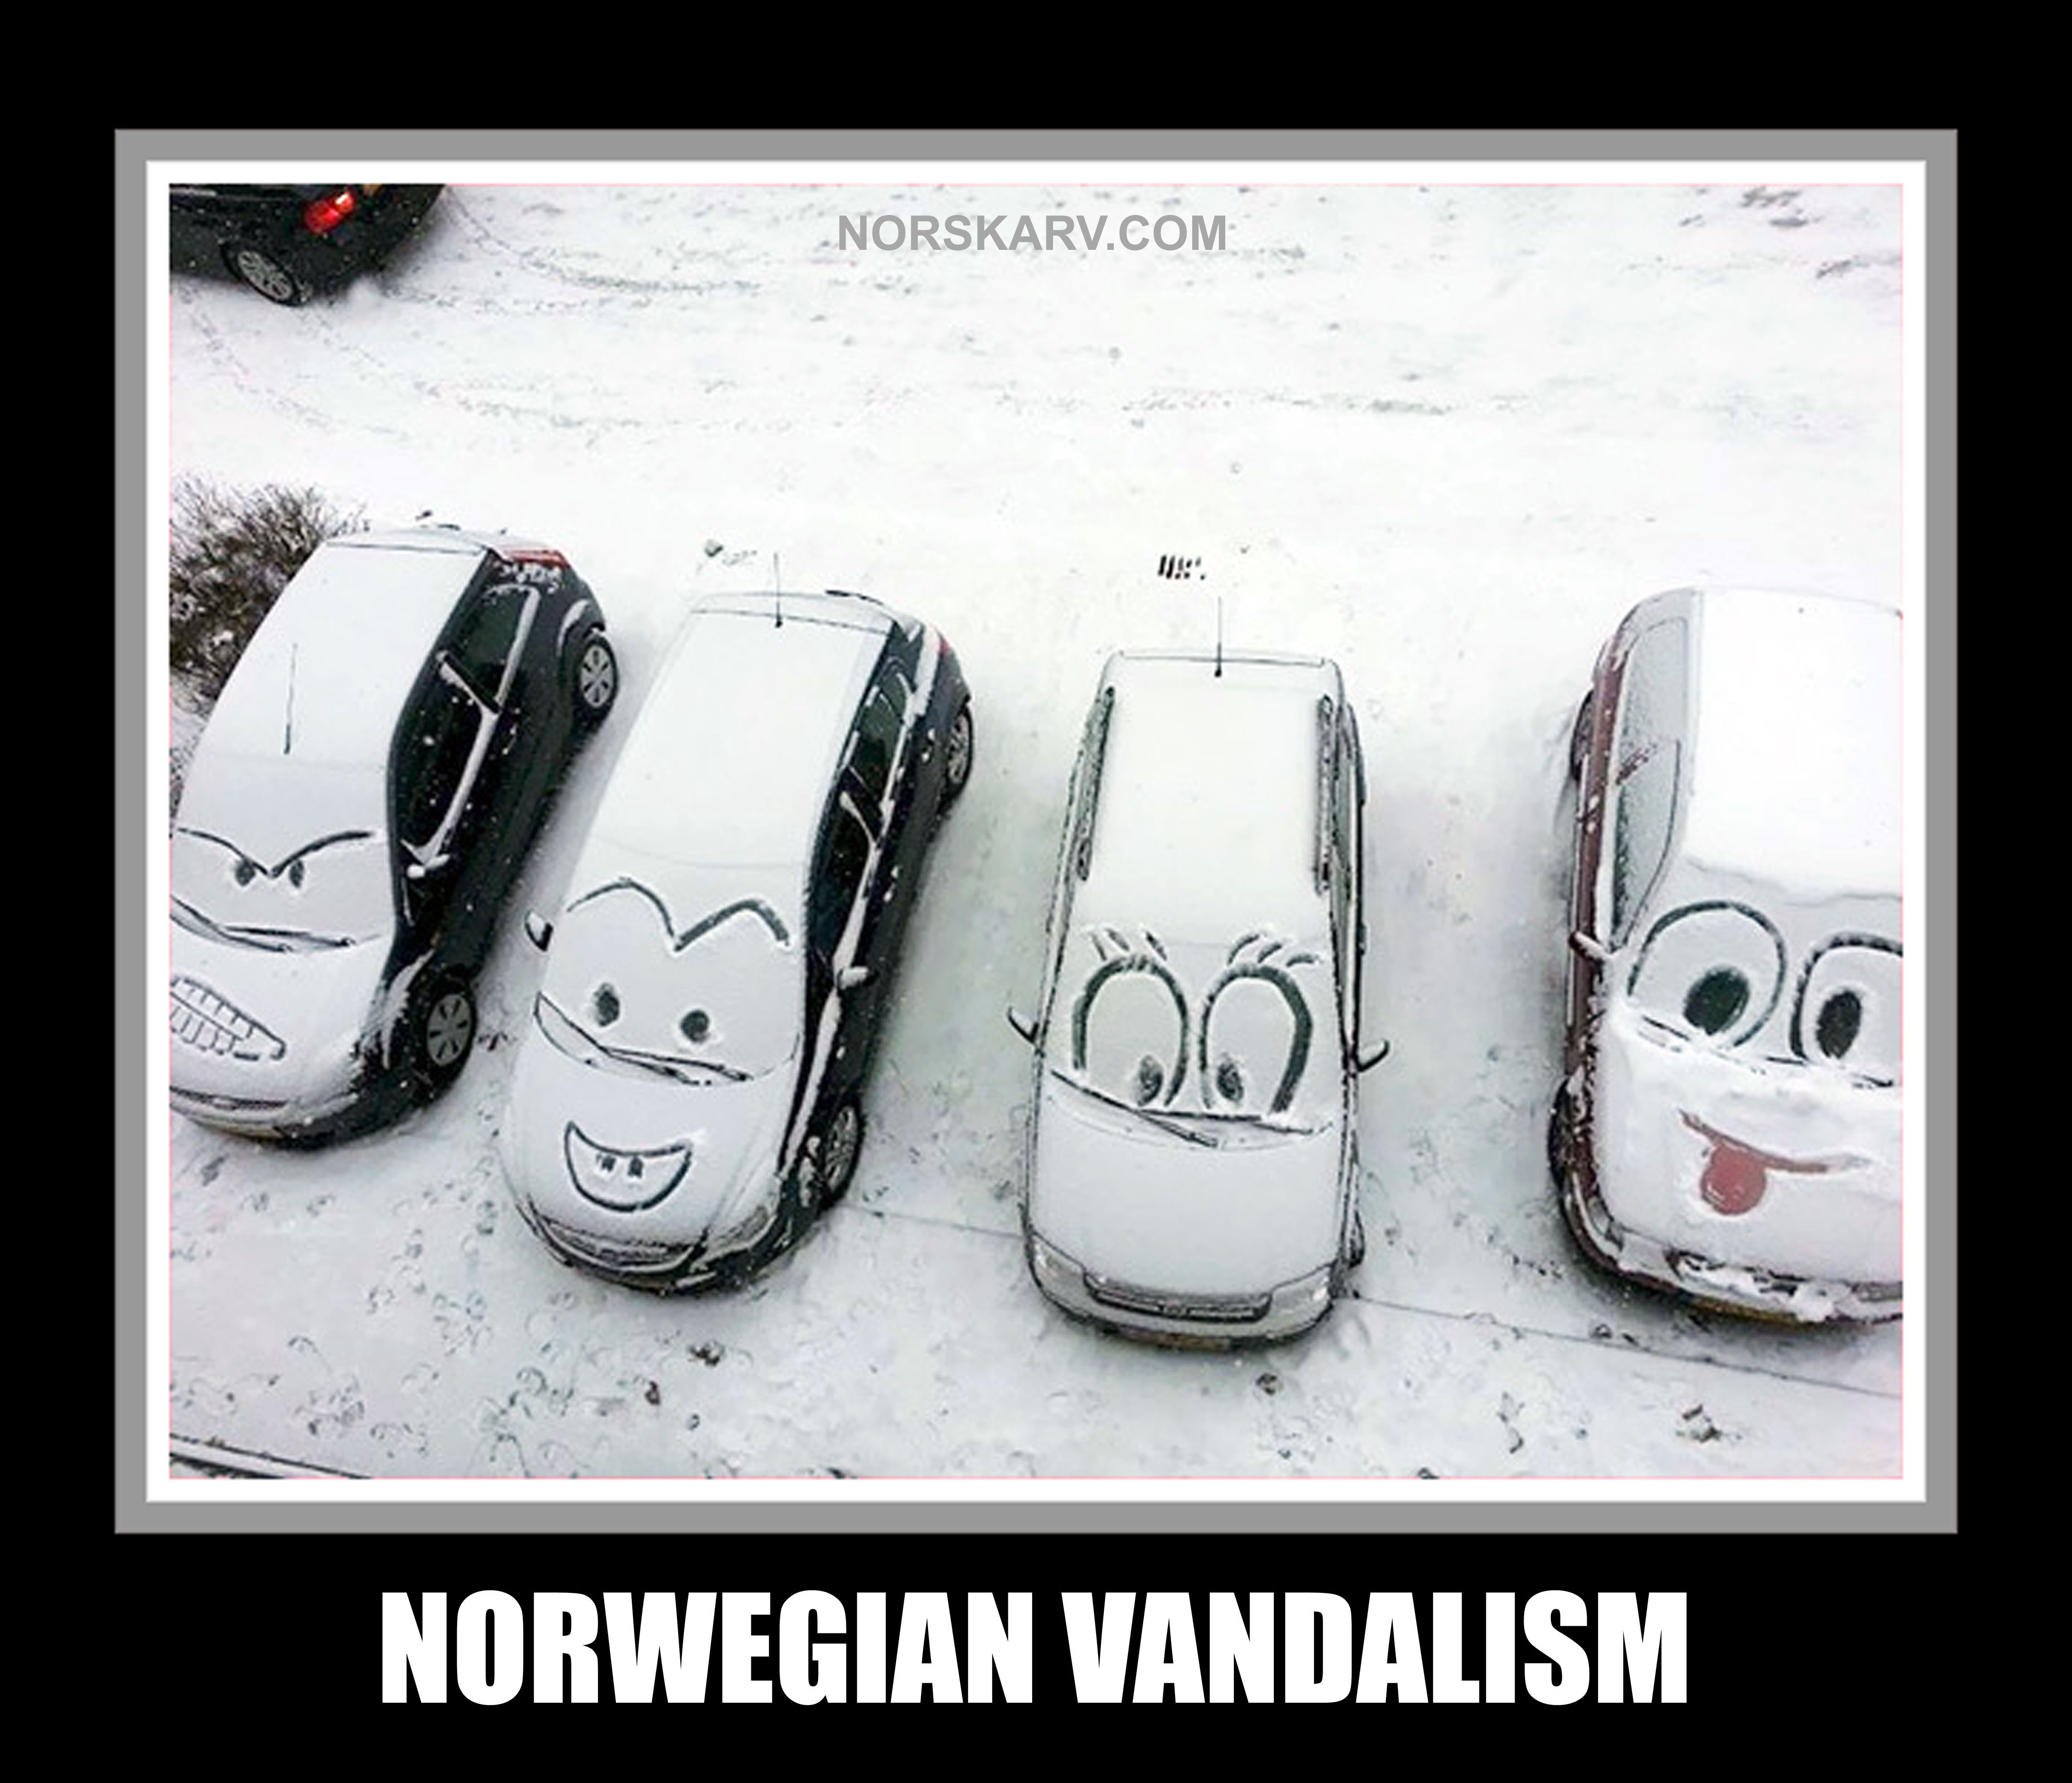 Norwegian Vandalism Meme Norway Funny Humor Snow Cars From Norskarv Com Funny Laugh Funny Pictures